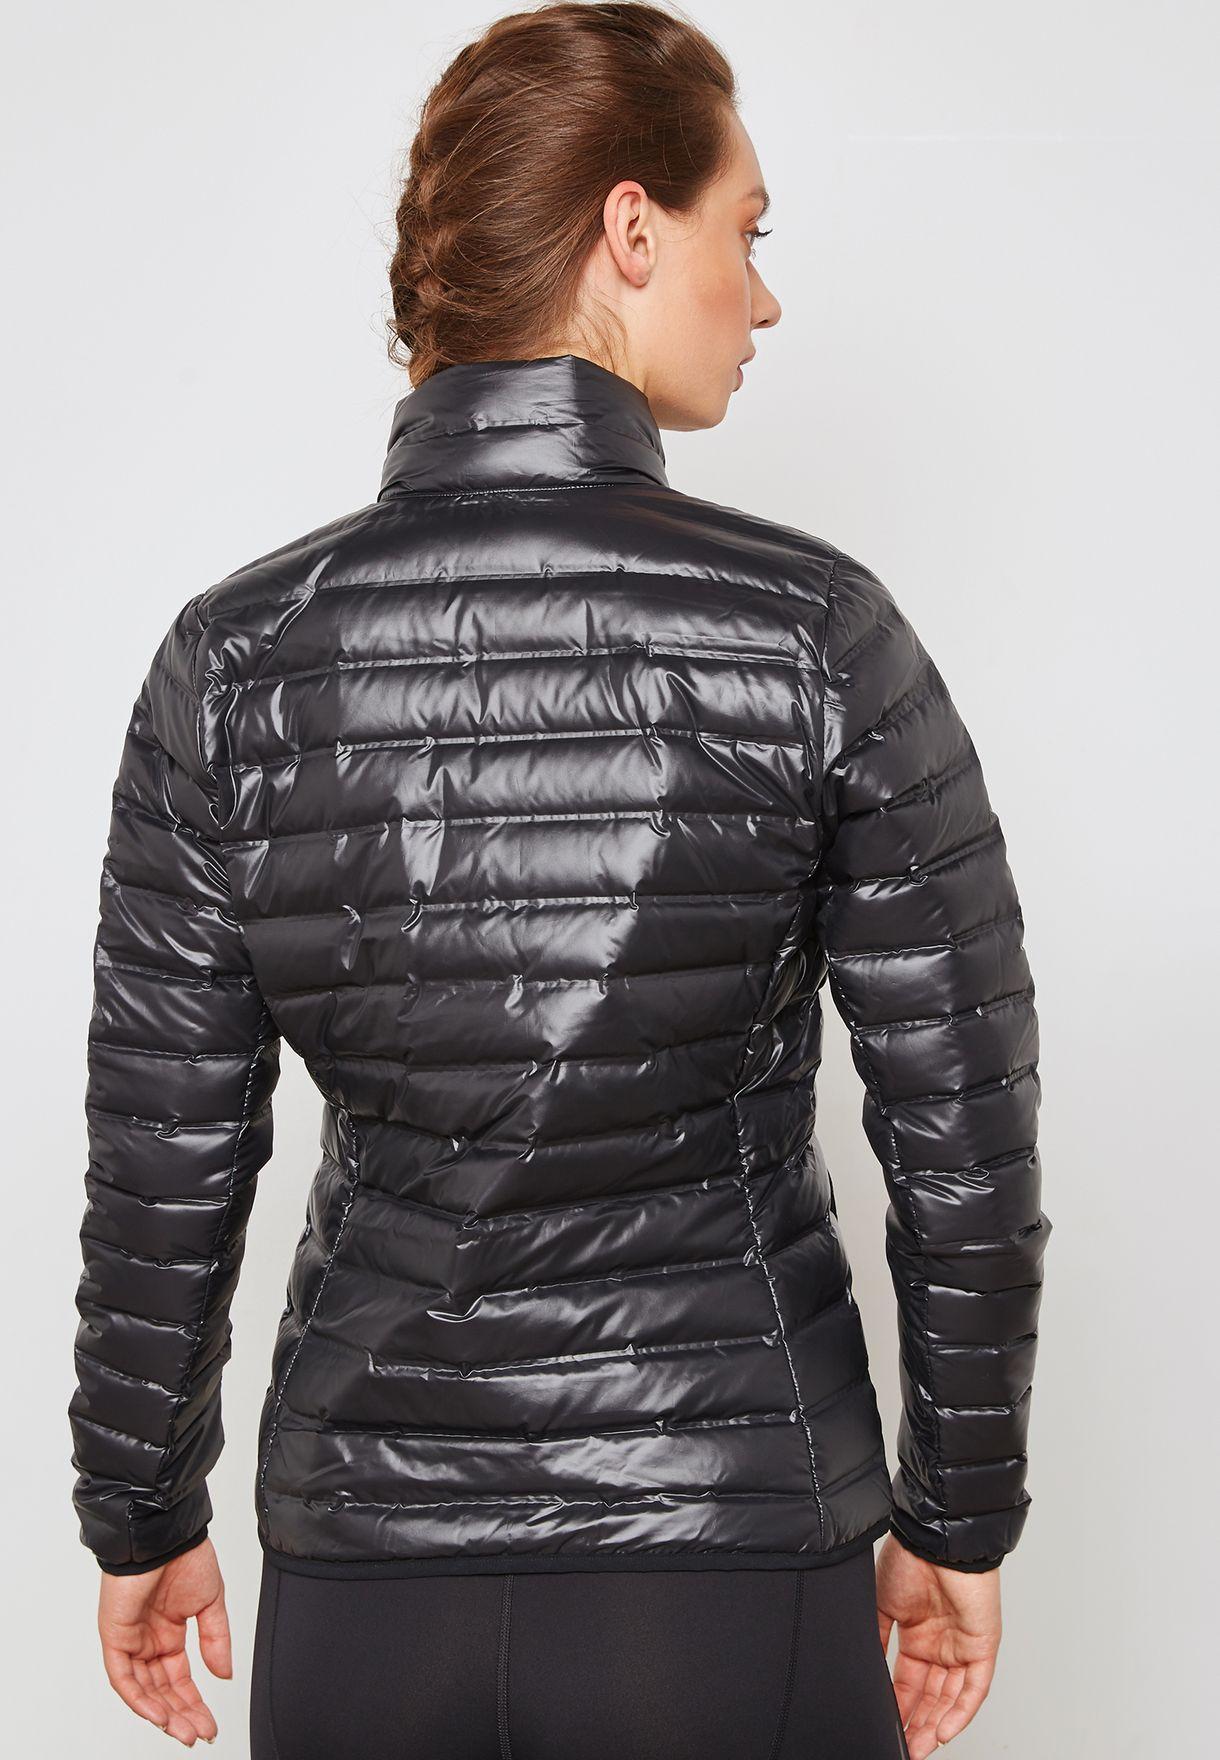 Varilite Padded Jacket